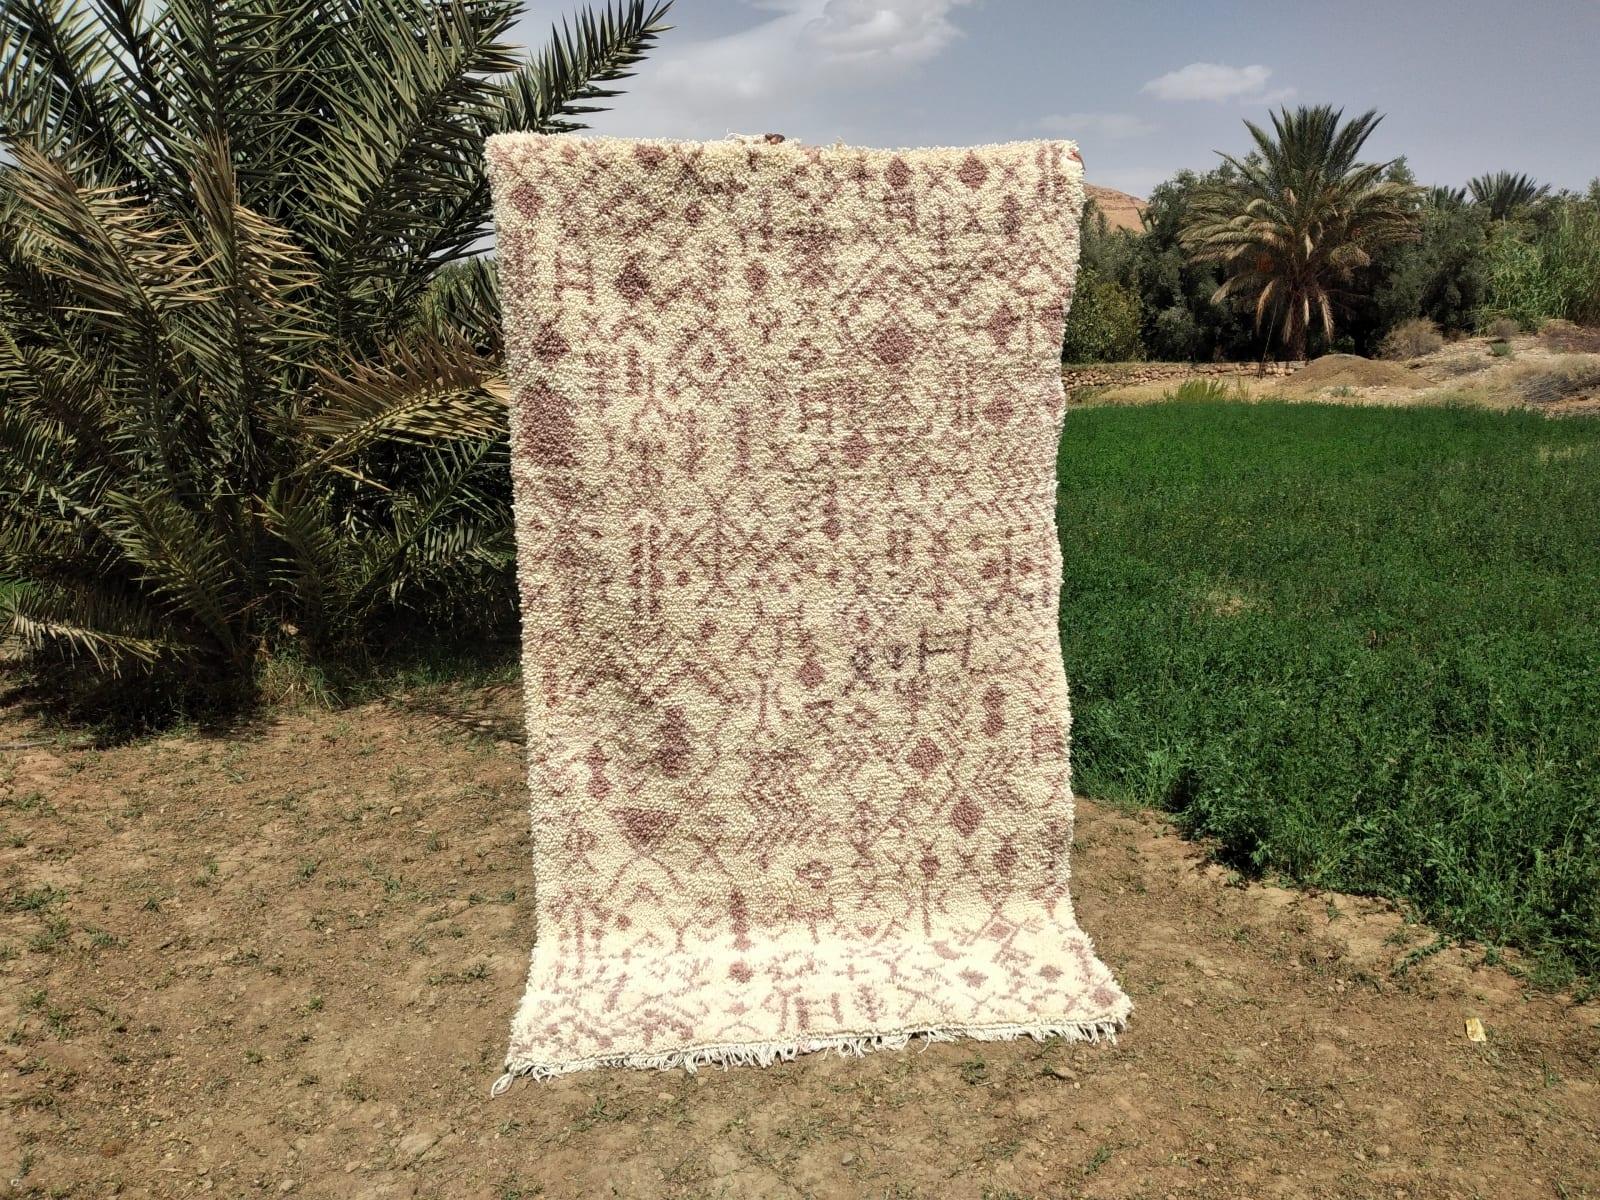 Pile Knot Rug Cotton Warp Pink, White Morocco